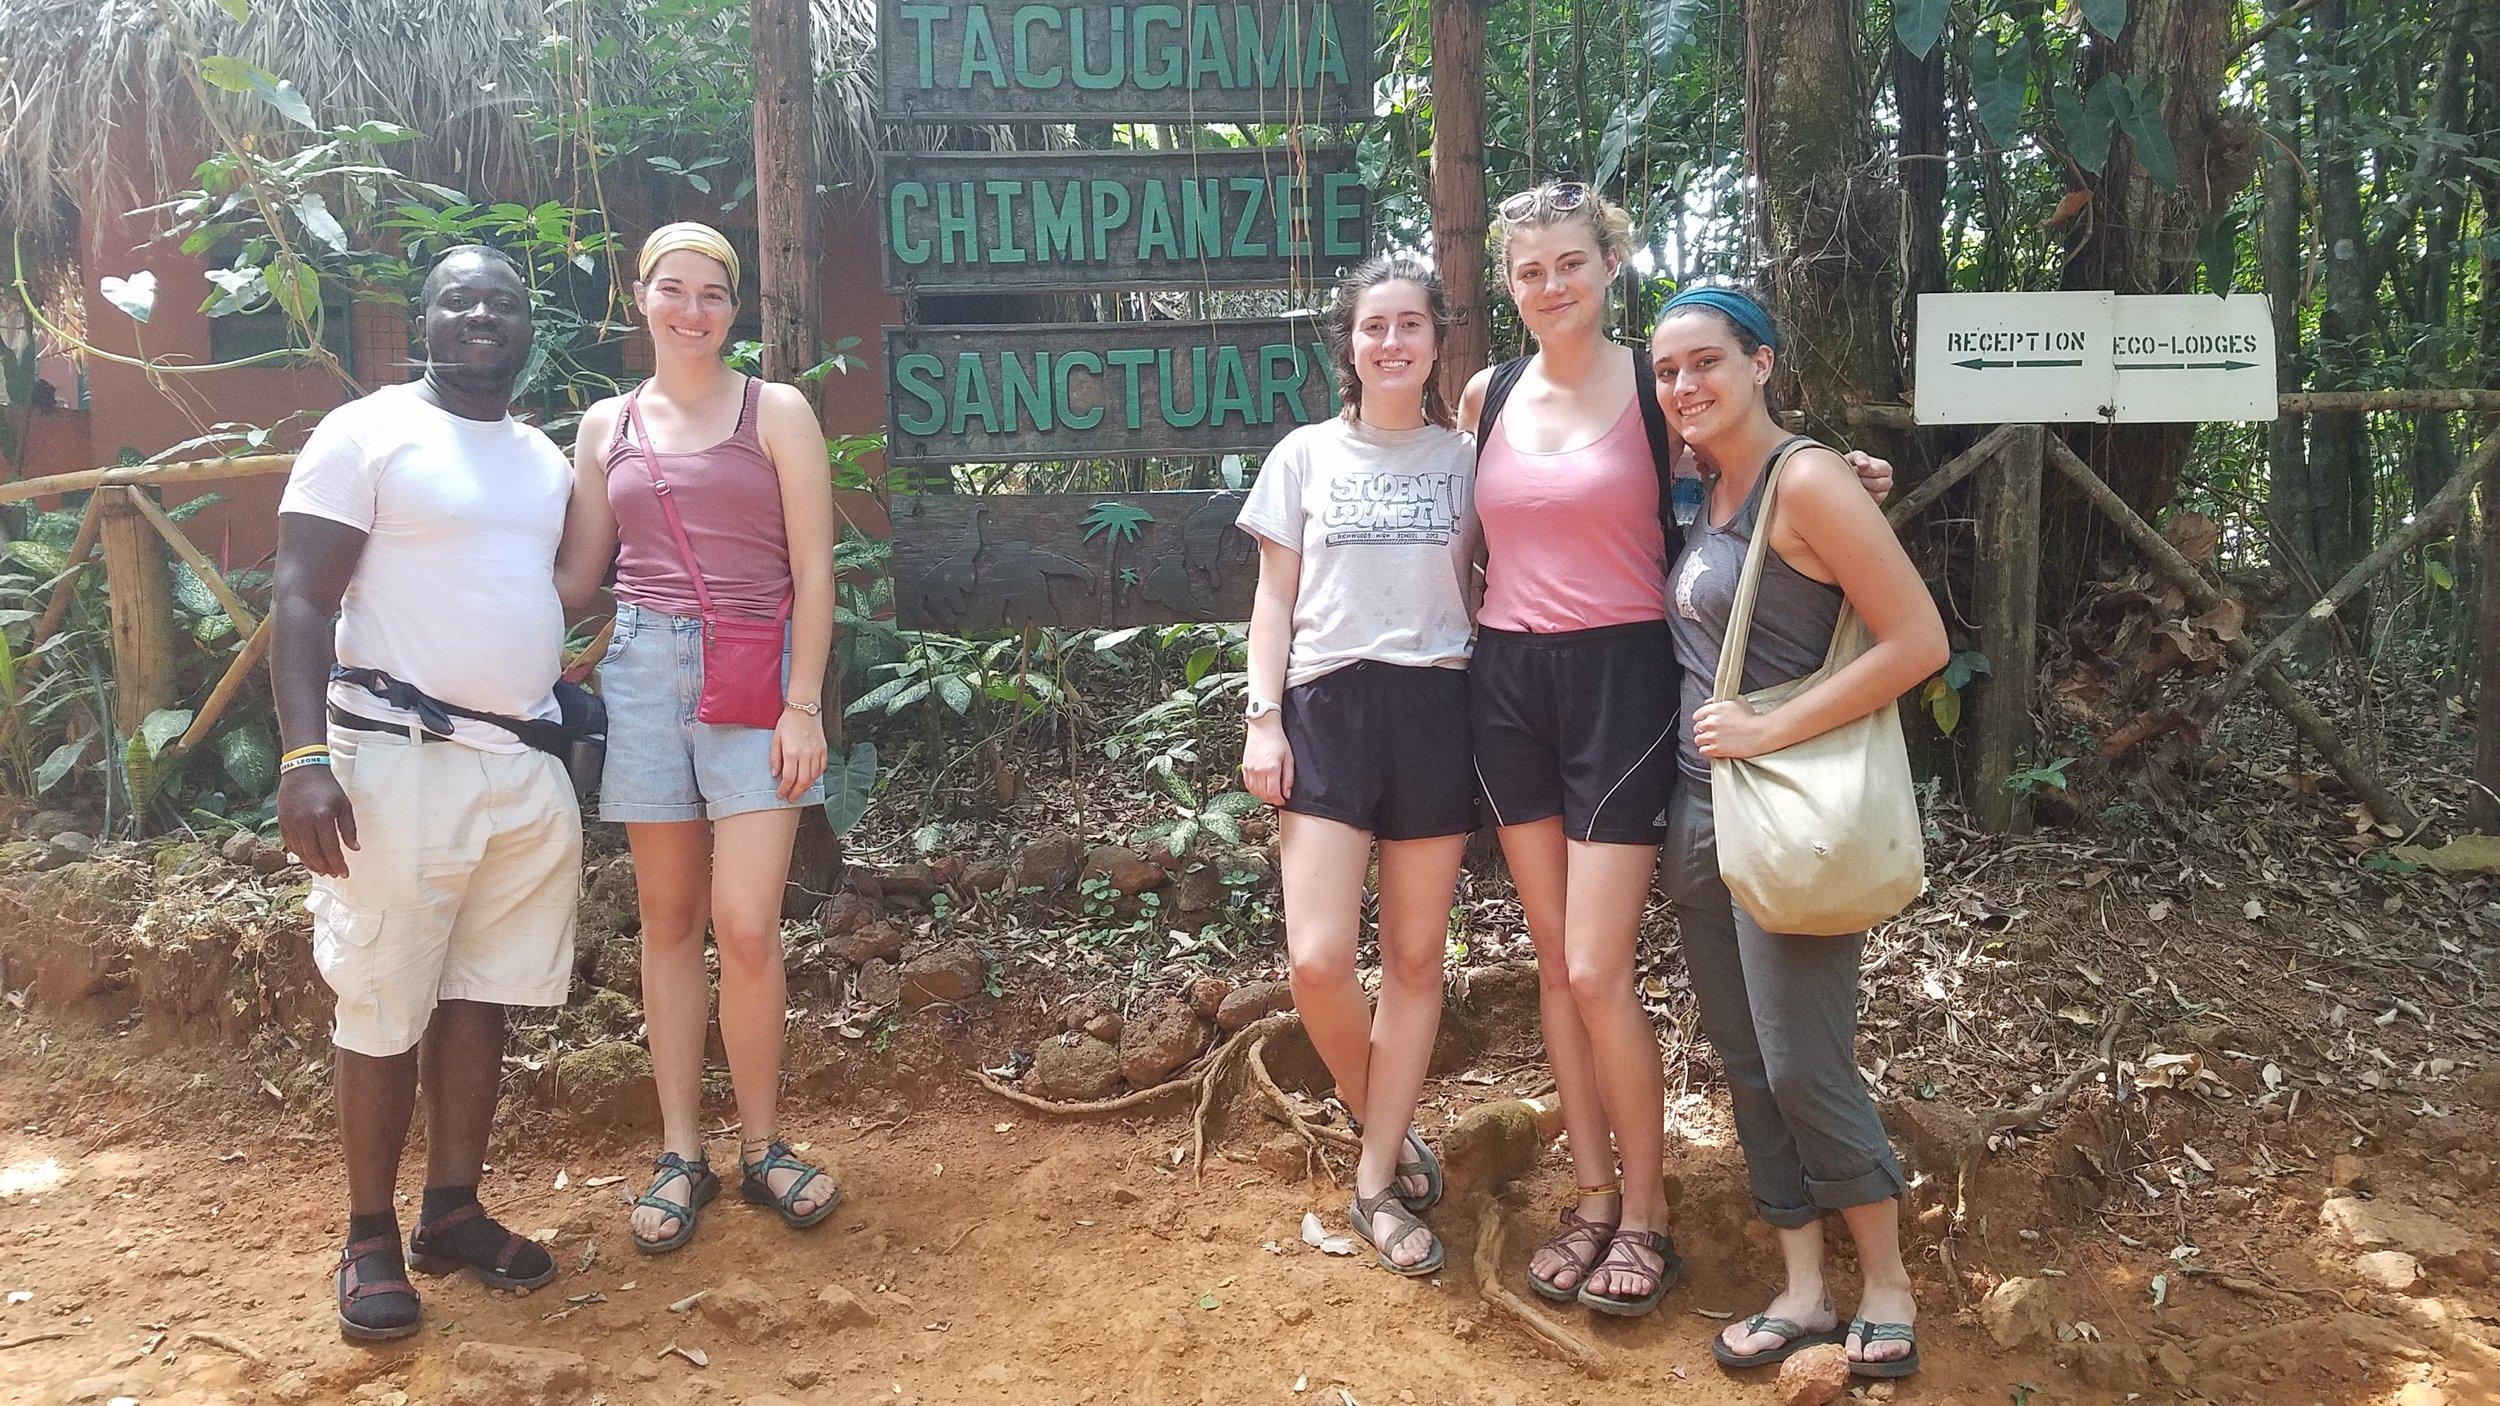 Visit Tacugama Chimpanzee Sanctuary